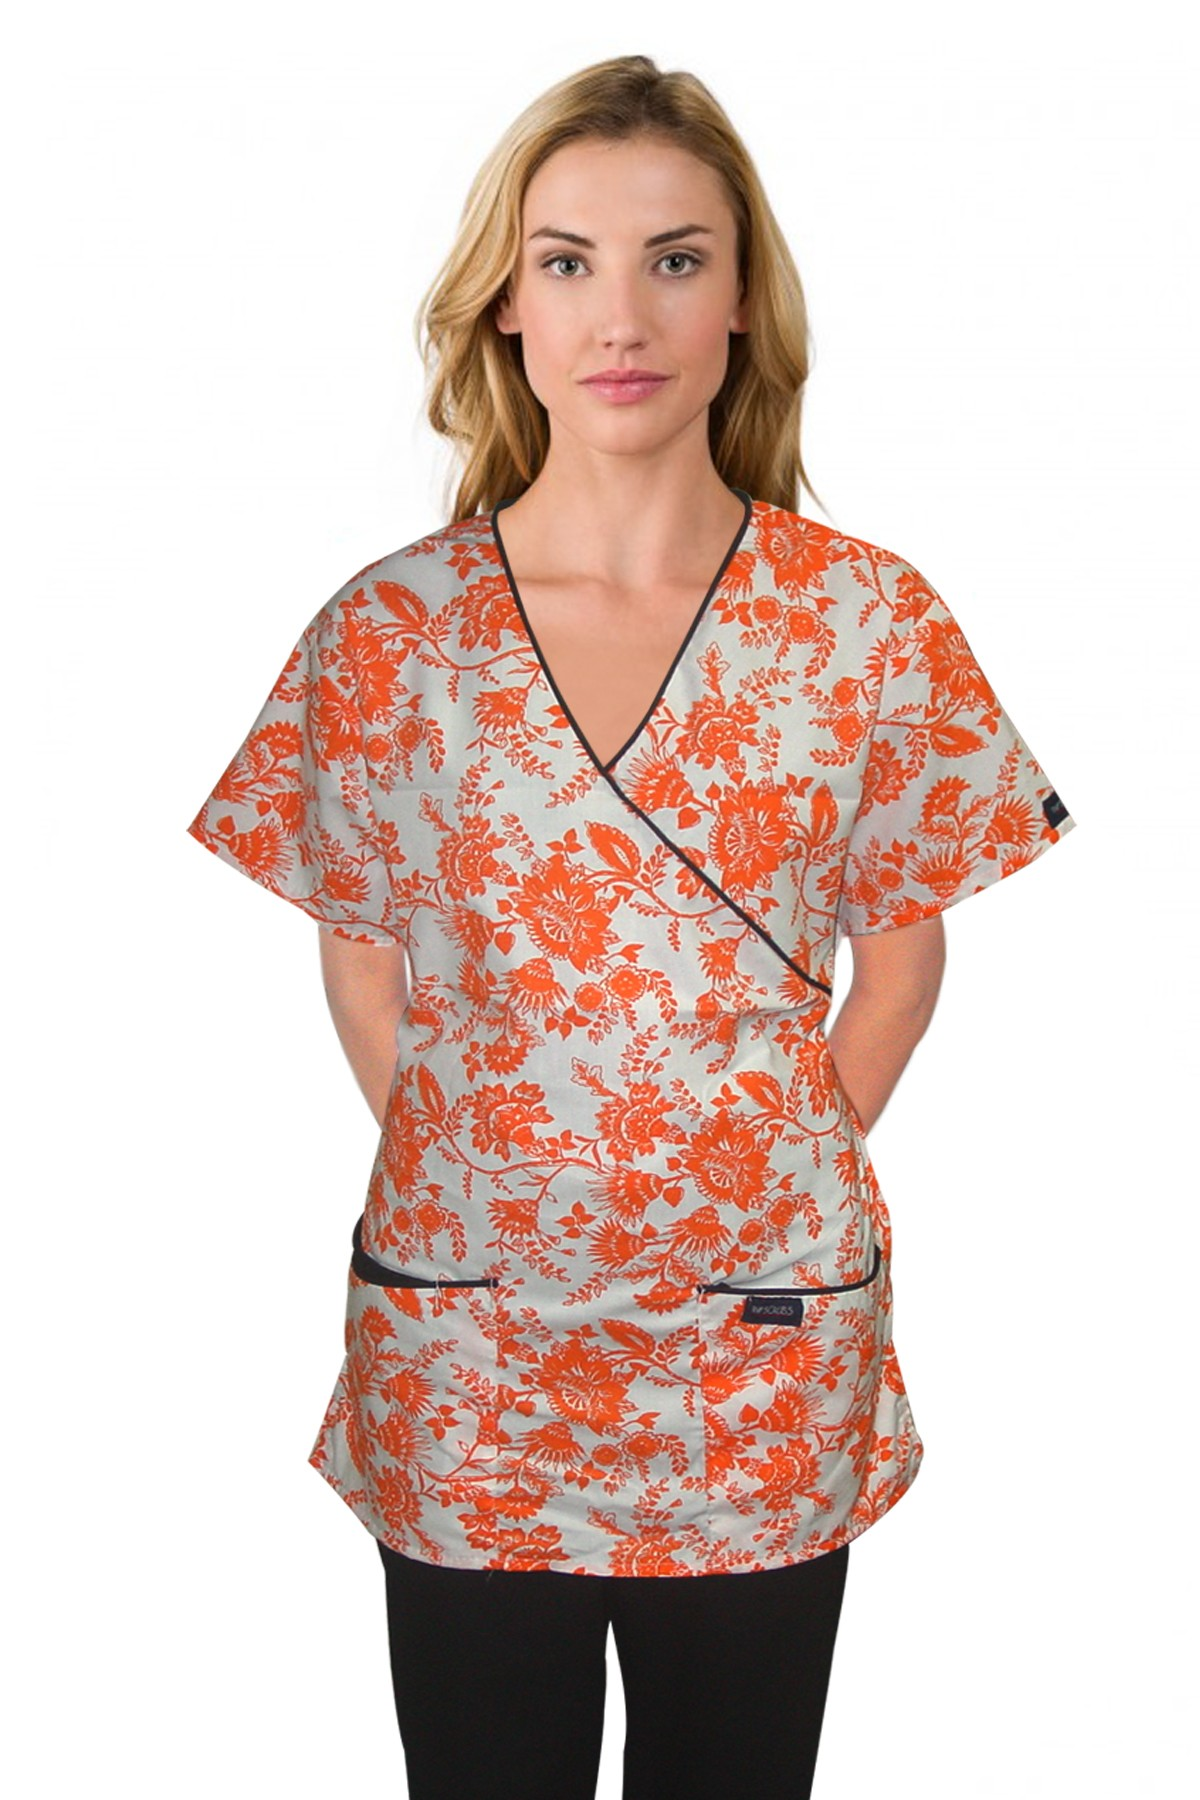 Printed scrub set mock wrap 5 pocket half sleeve petal orange print with black (top 3 pocket with bottom 2 pocket boot cut)